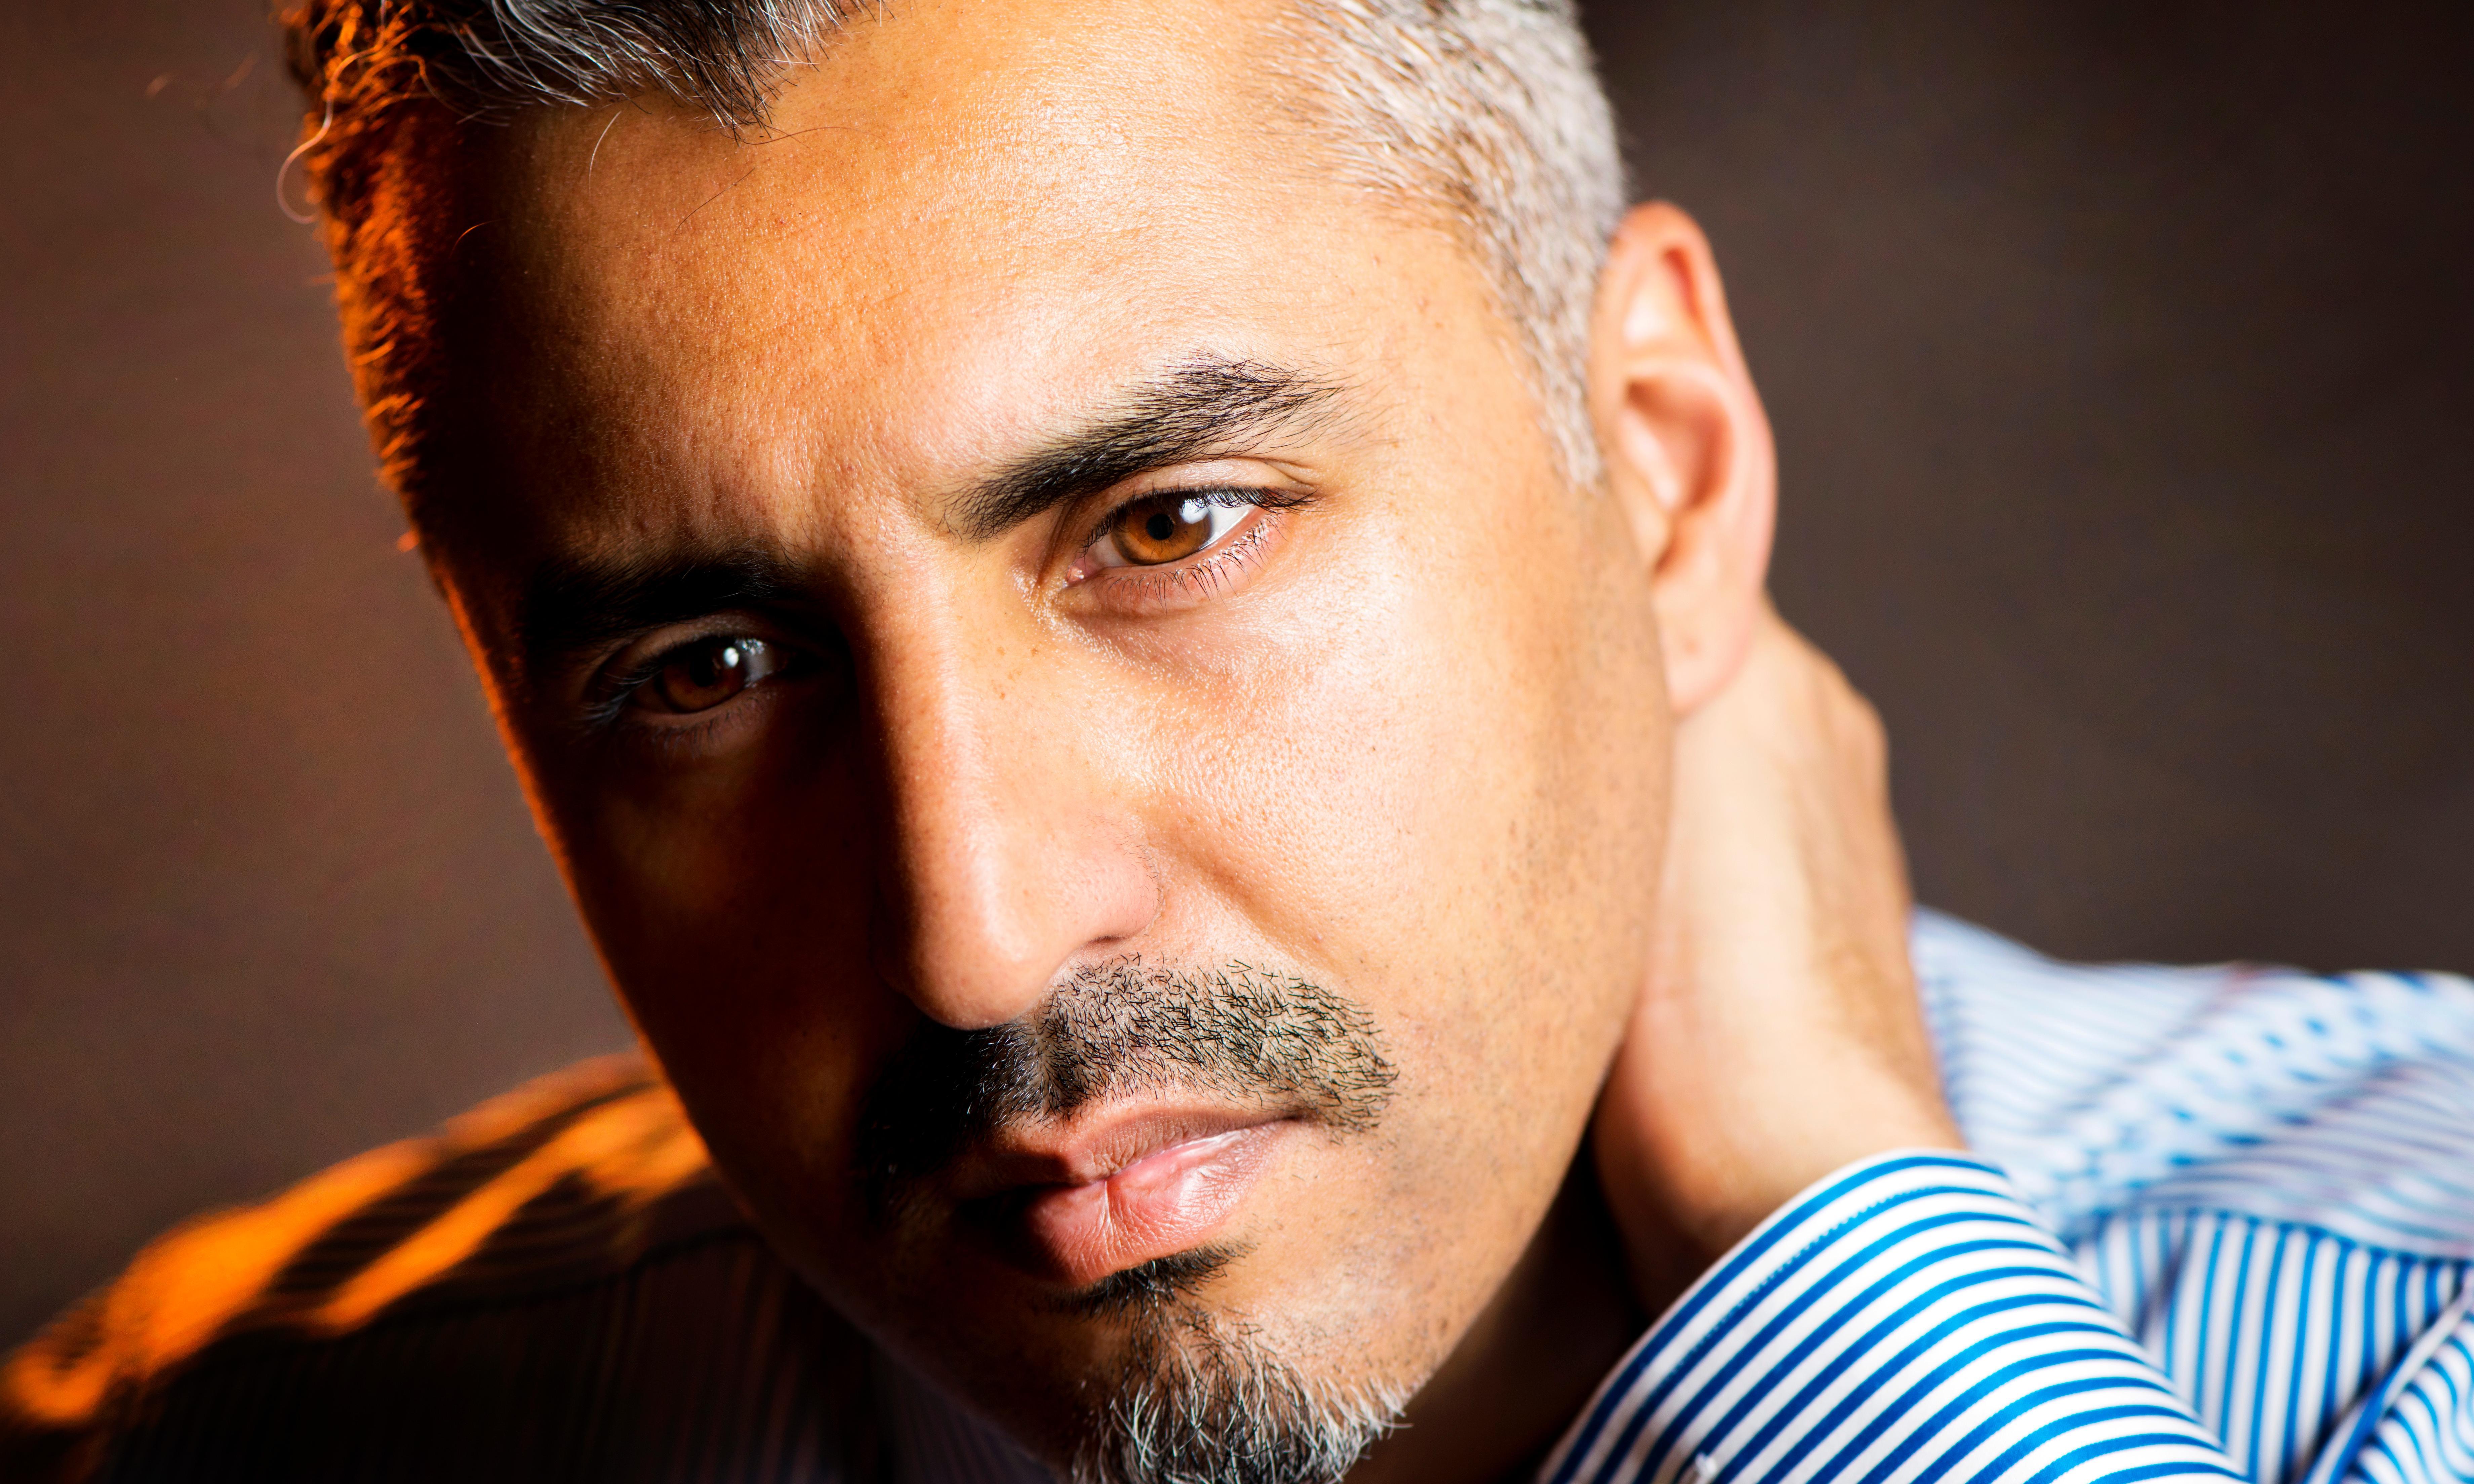 Maajid Nawaz, LBC presenter, hurt in 'racially motivated' attack